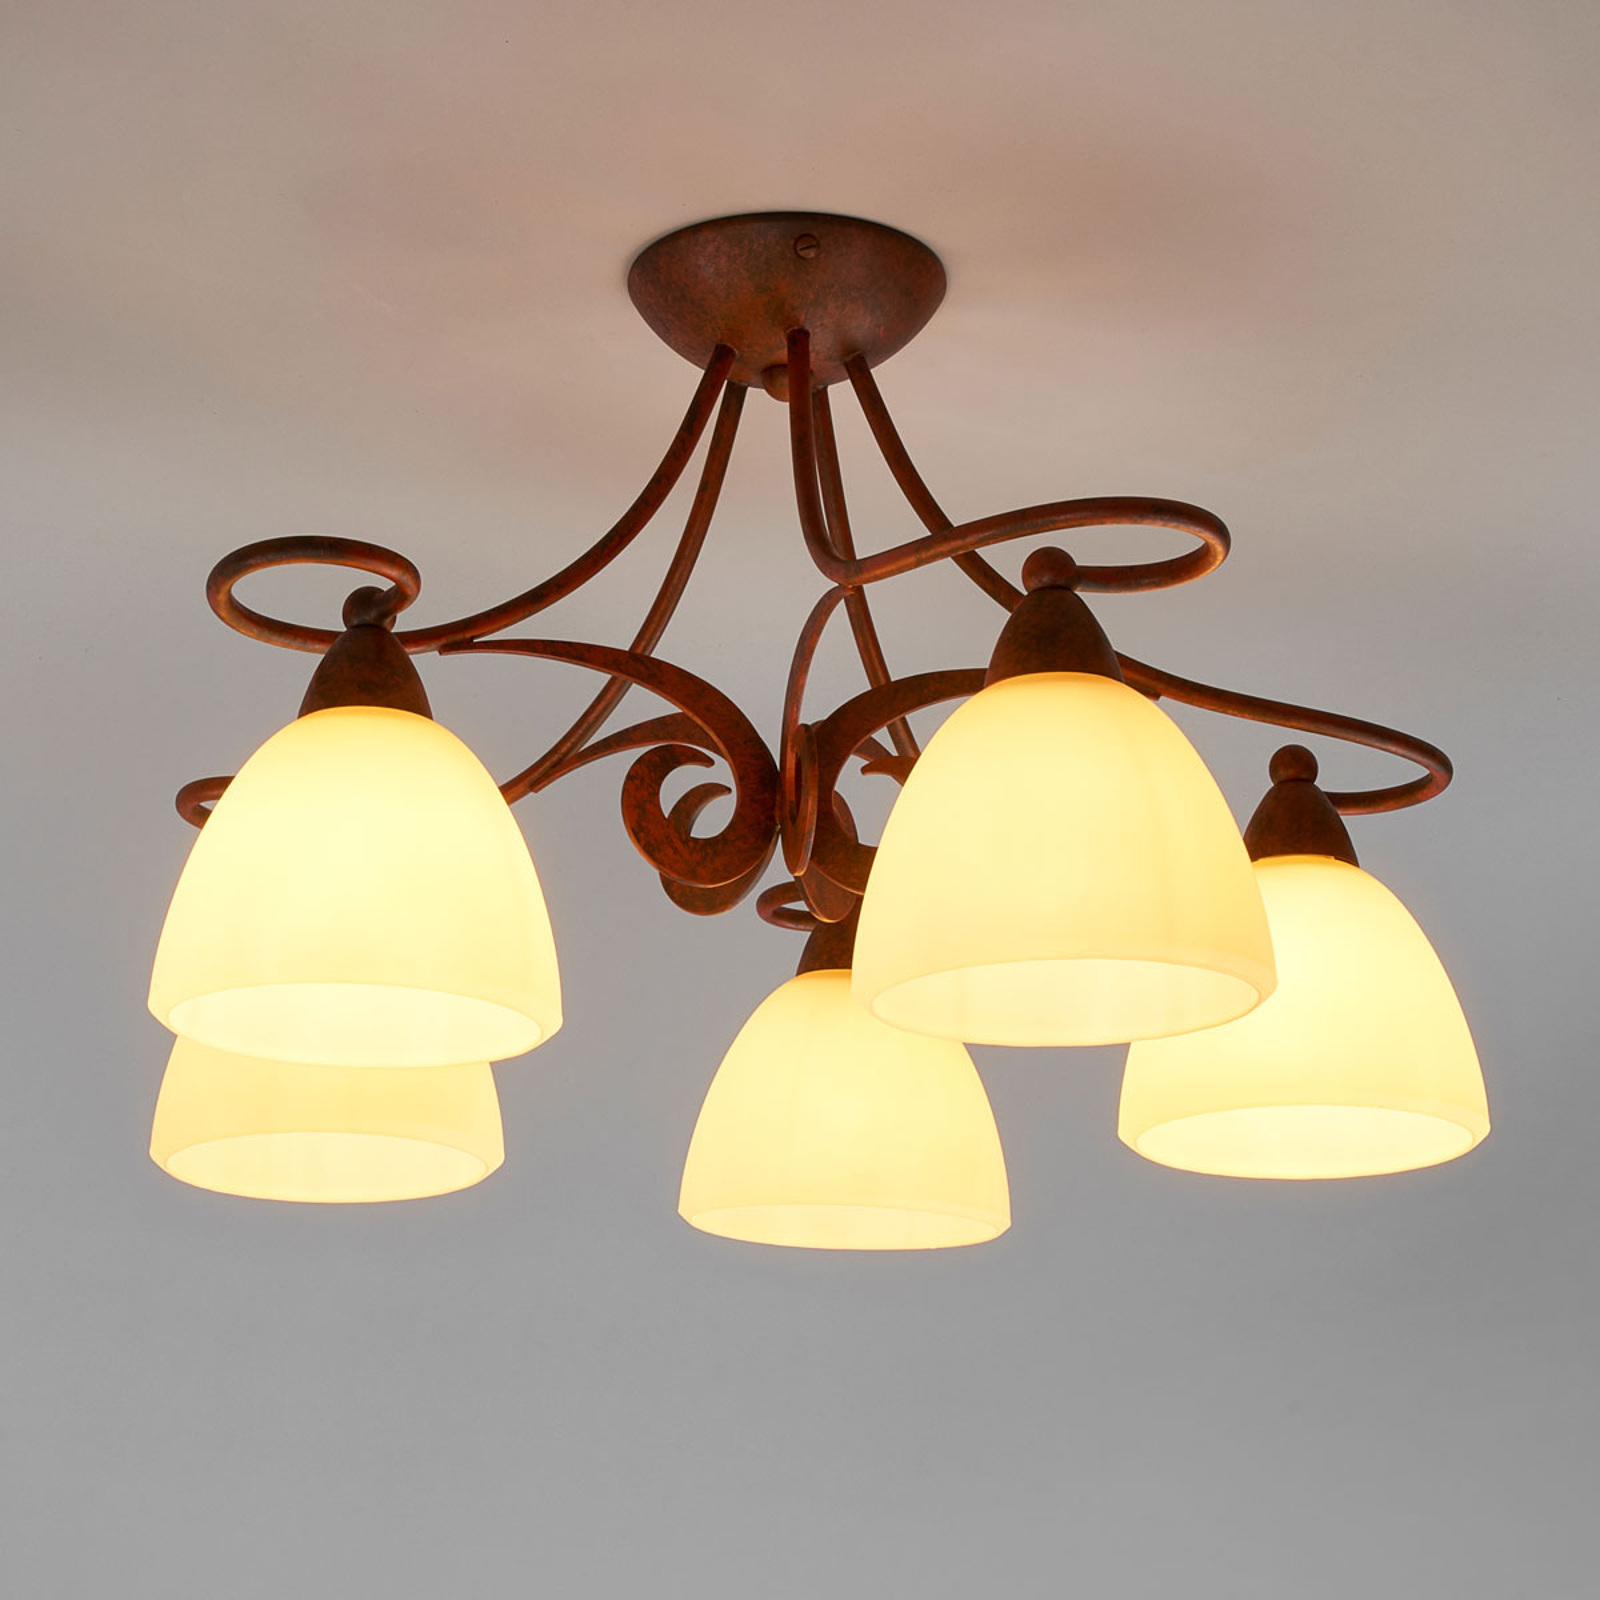 Rustykalna lampa wisząca Ginevra, 5-punktowa